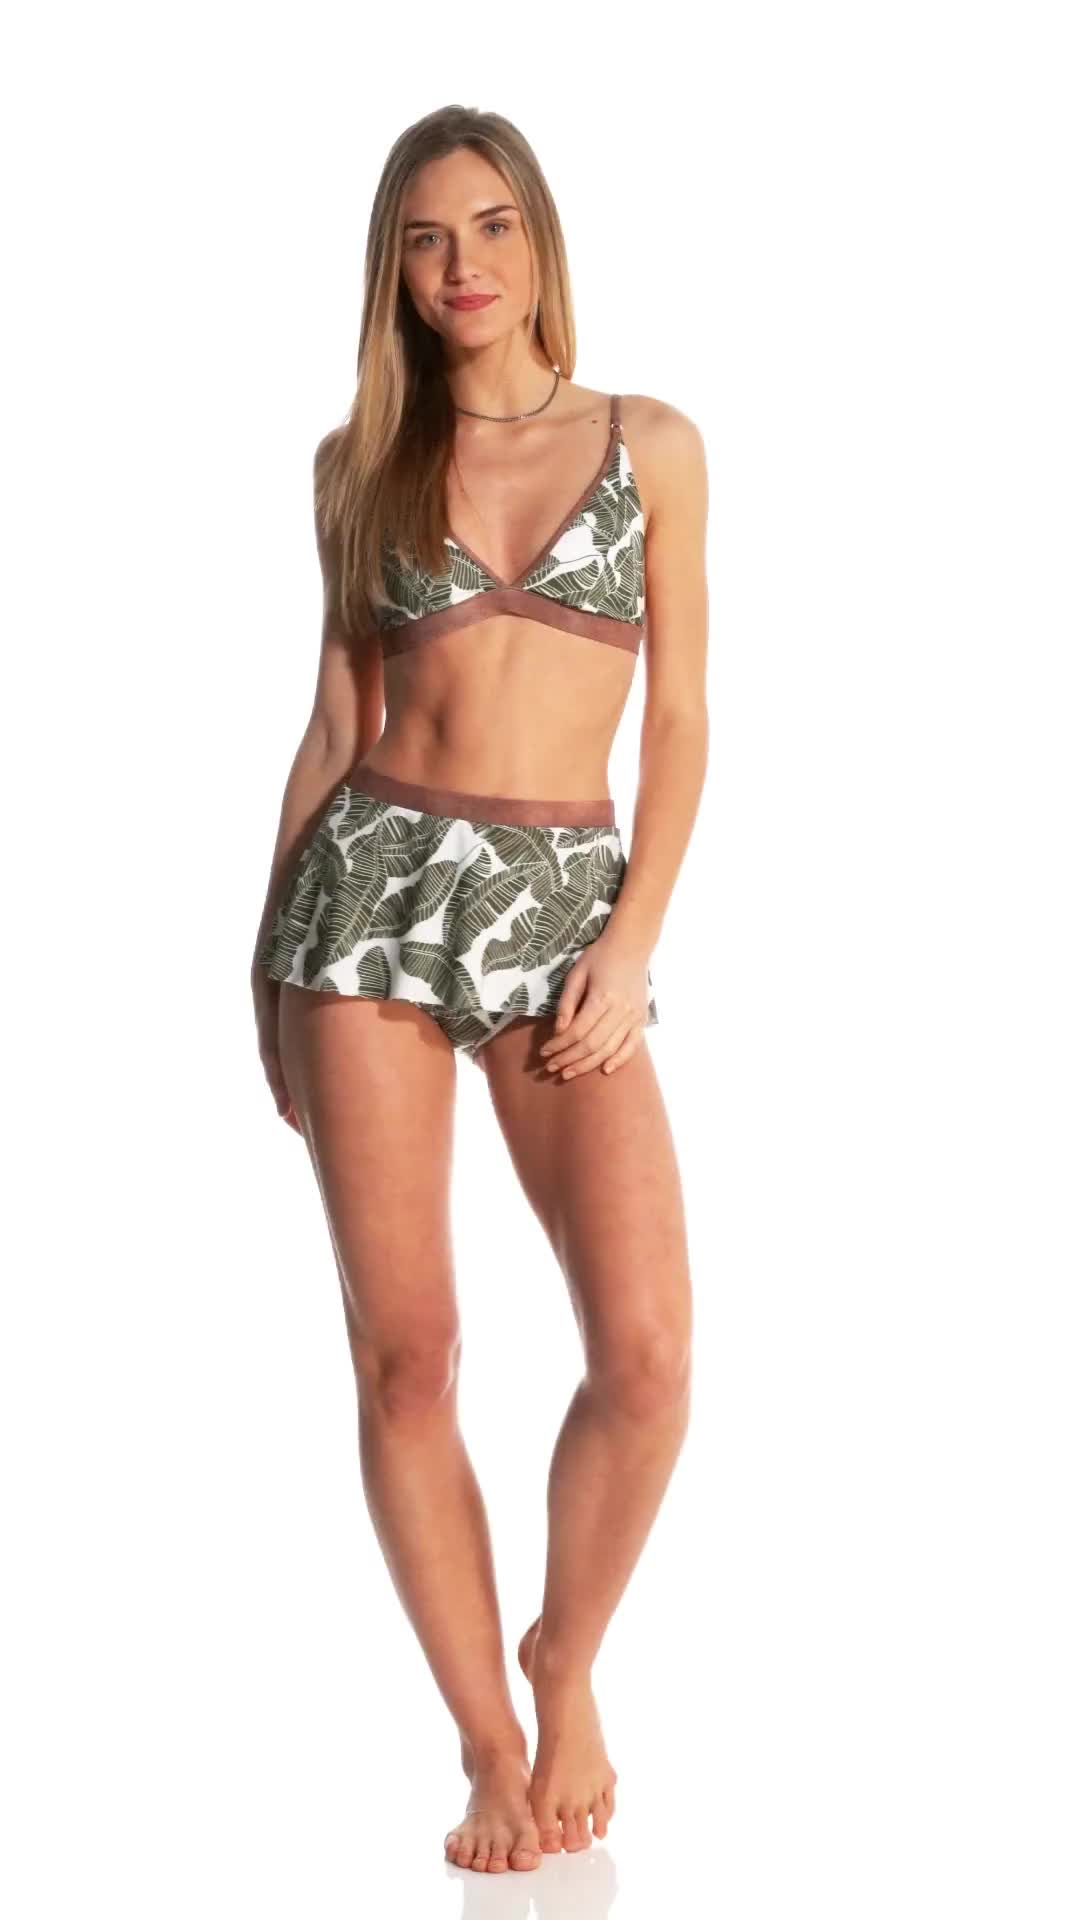 bikini, claire gerhardstein, model, modeling, swimsuit, 8154837_RO_bit1600 GIFs